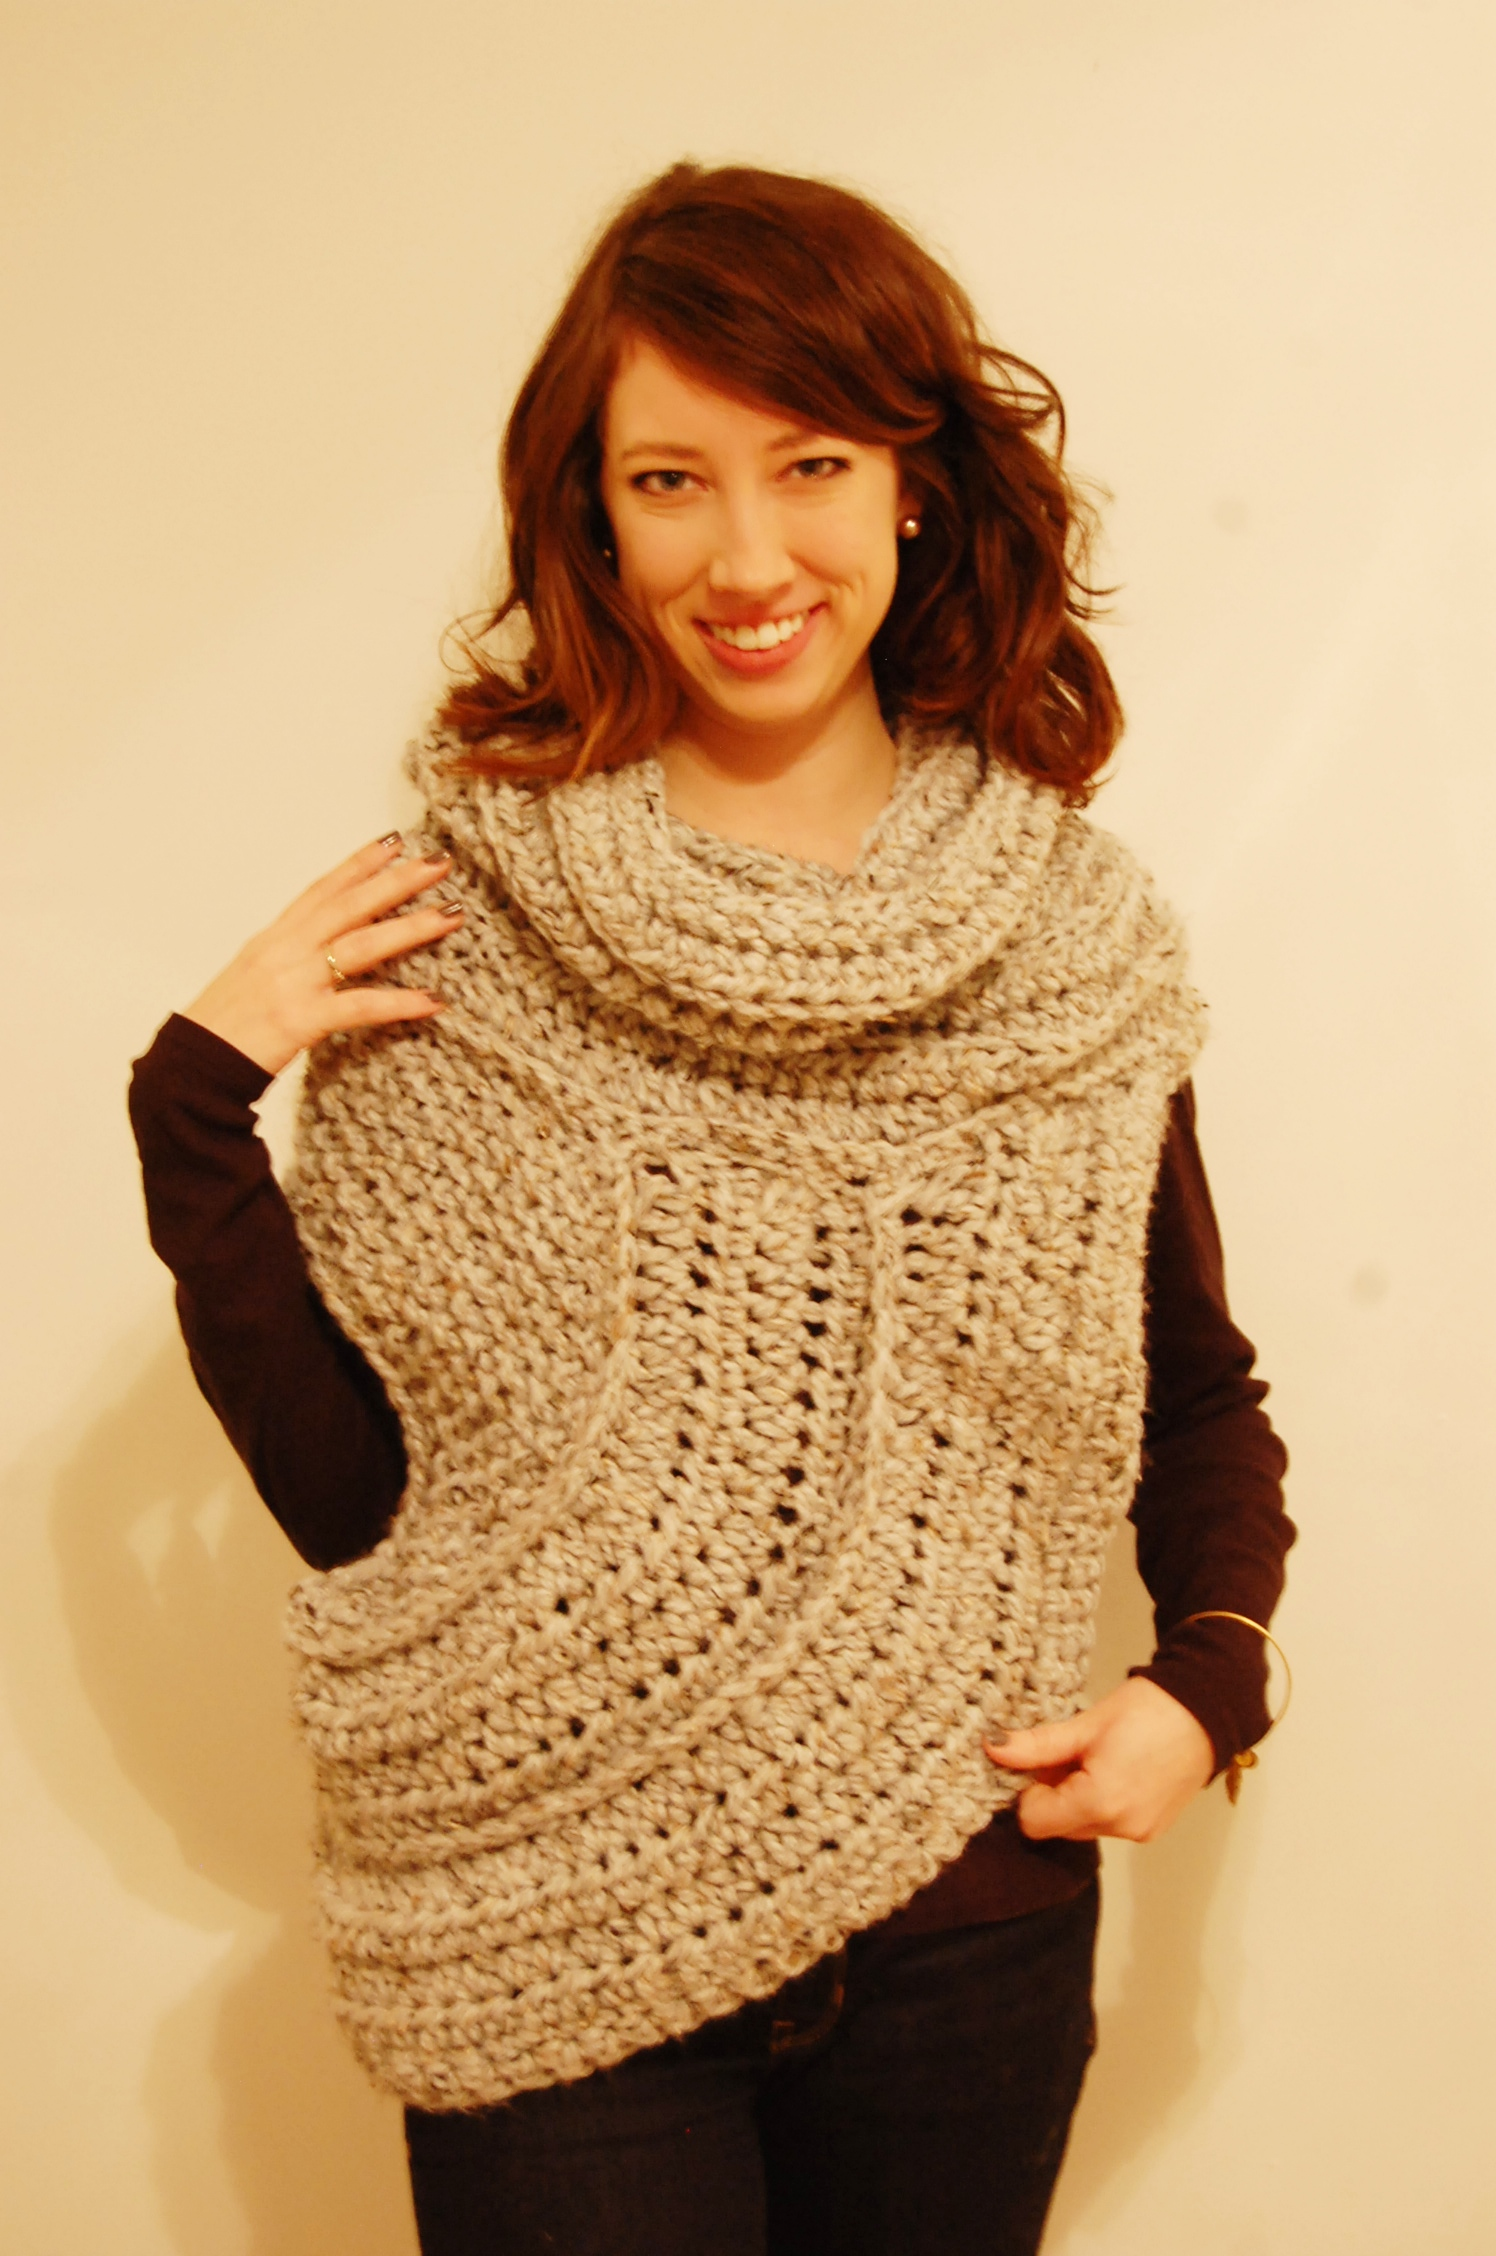 Katniss Knitted Cowl Pattern : Katniss Cowl/Vest - Knit & Crochet Pattern